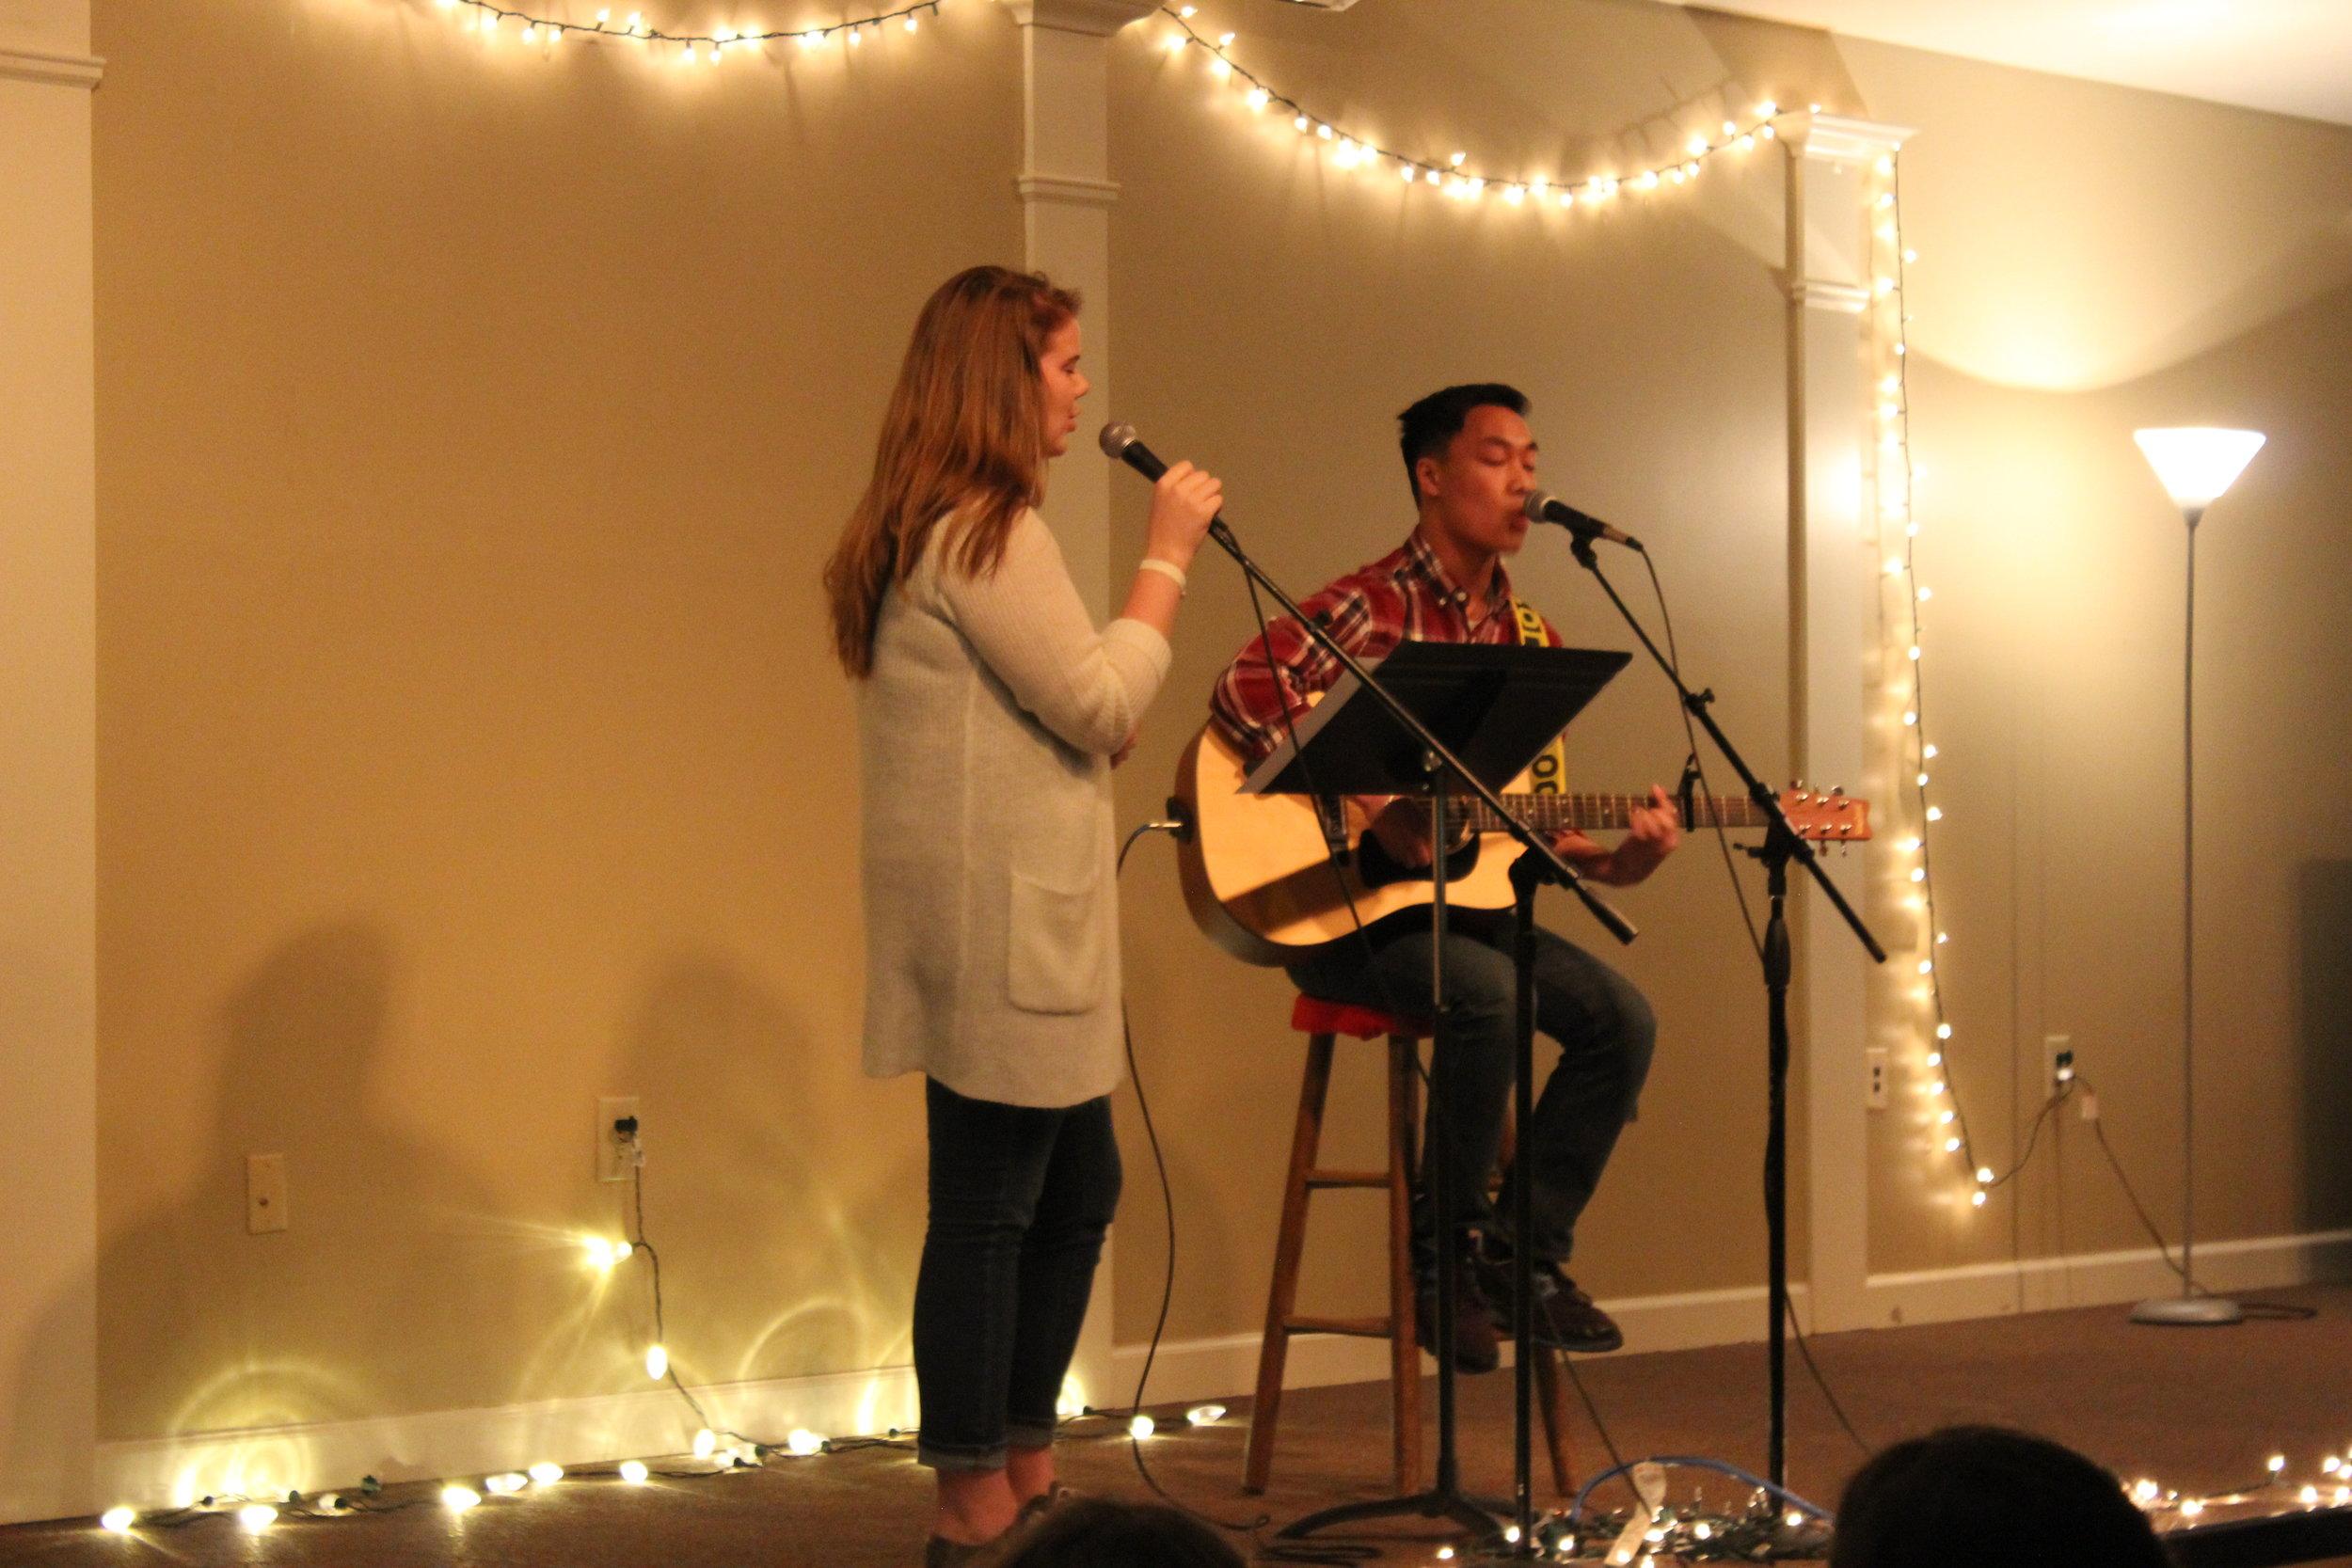 Adam Kelly and Harley Watkins singing an amazing duet.